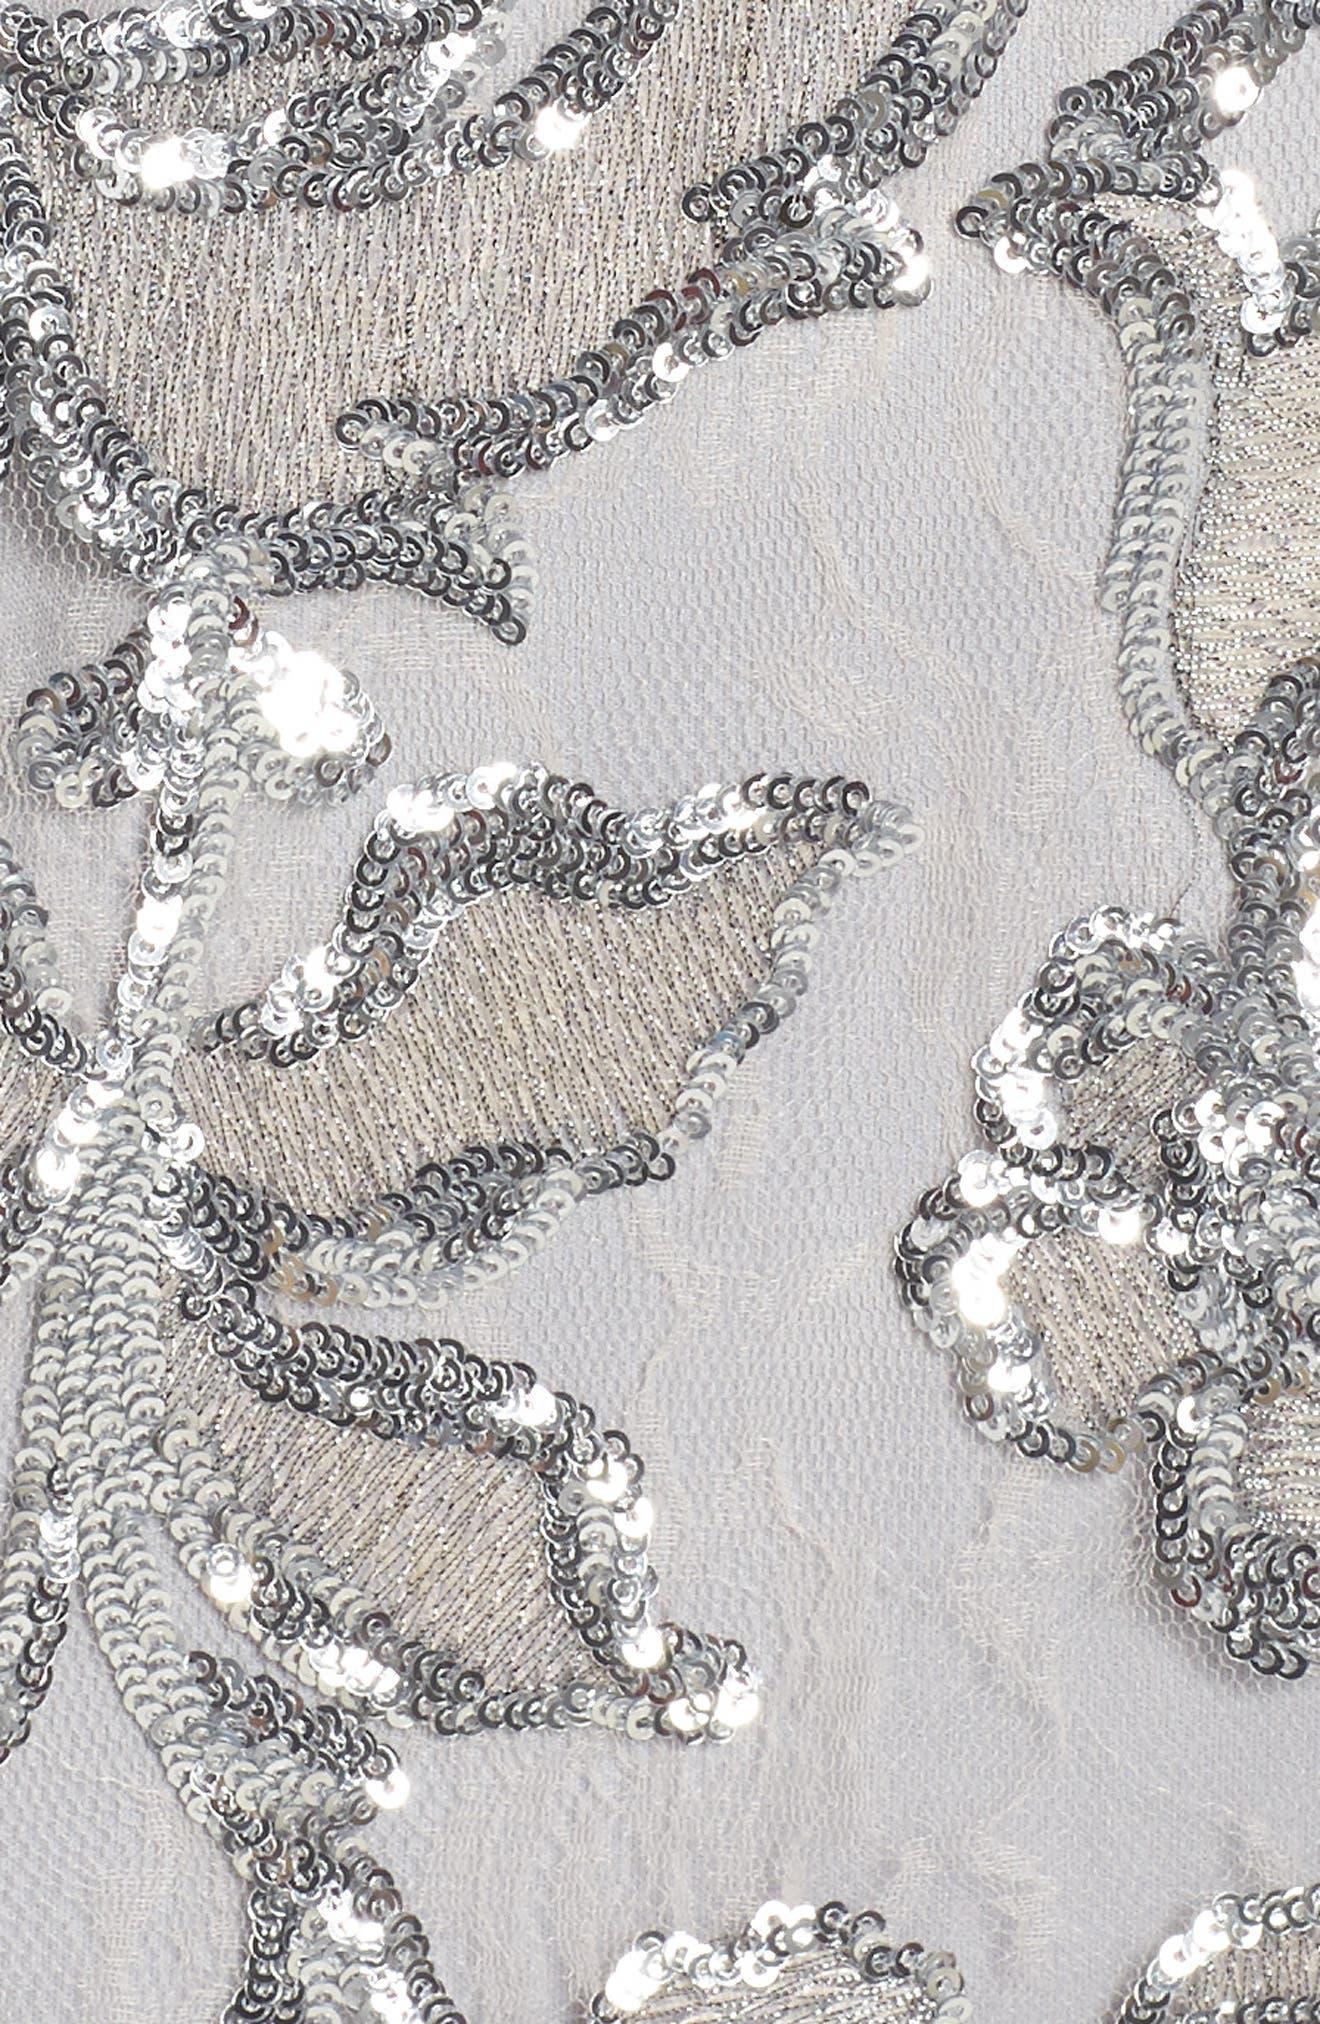 Floral Sequin Sheath Dress,                             Alternate thumbnail 6, color,                             SILVER